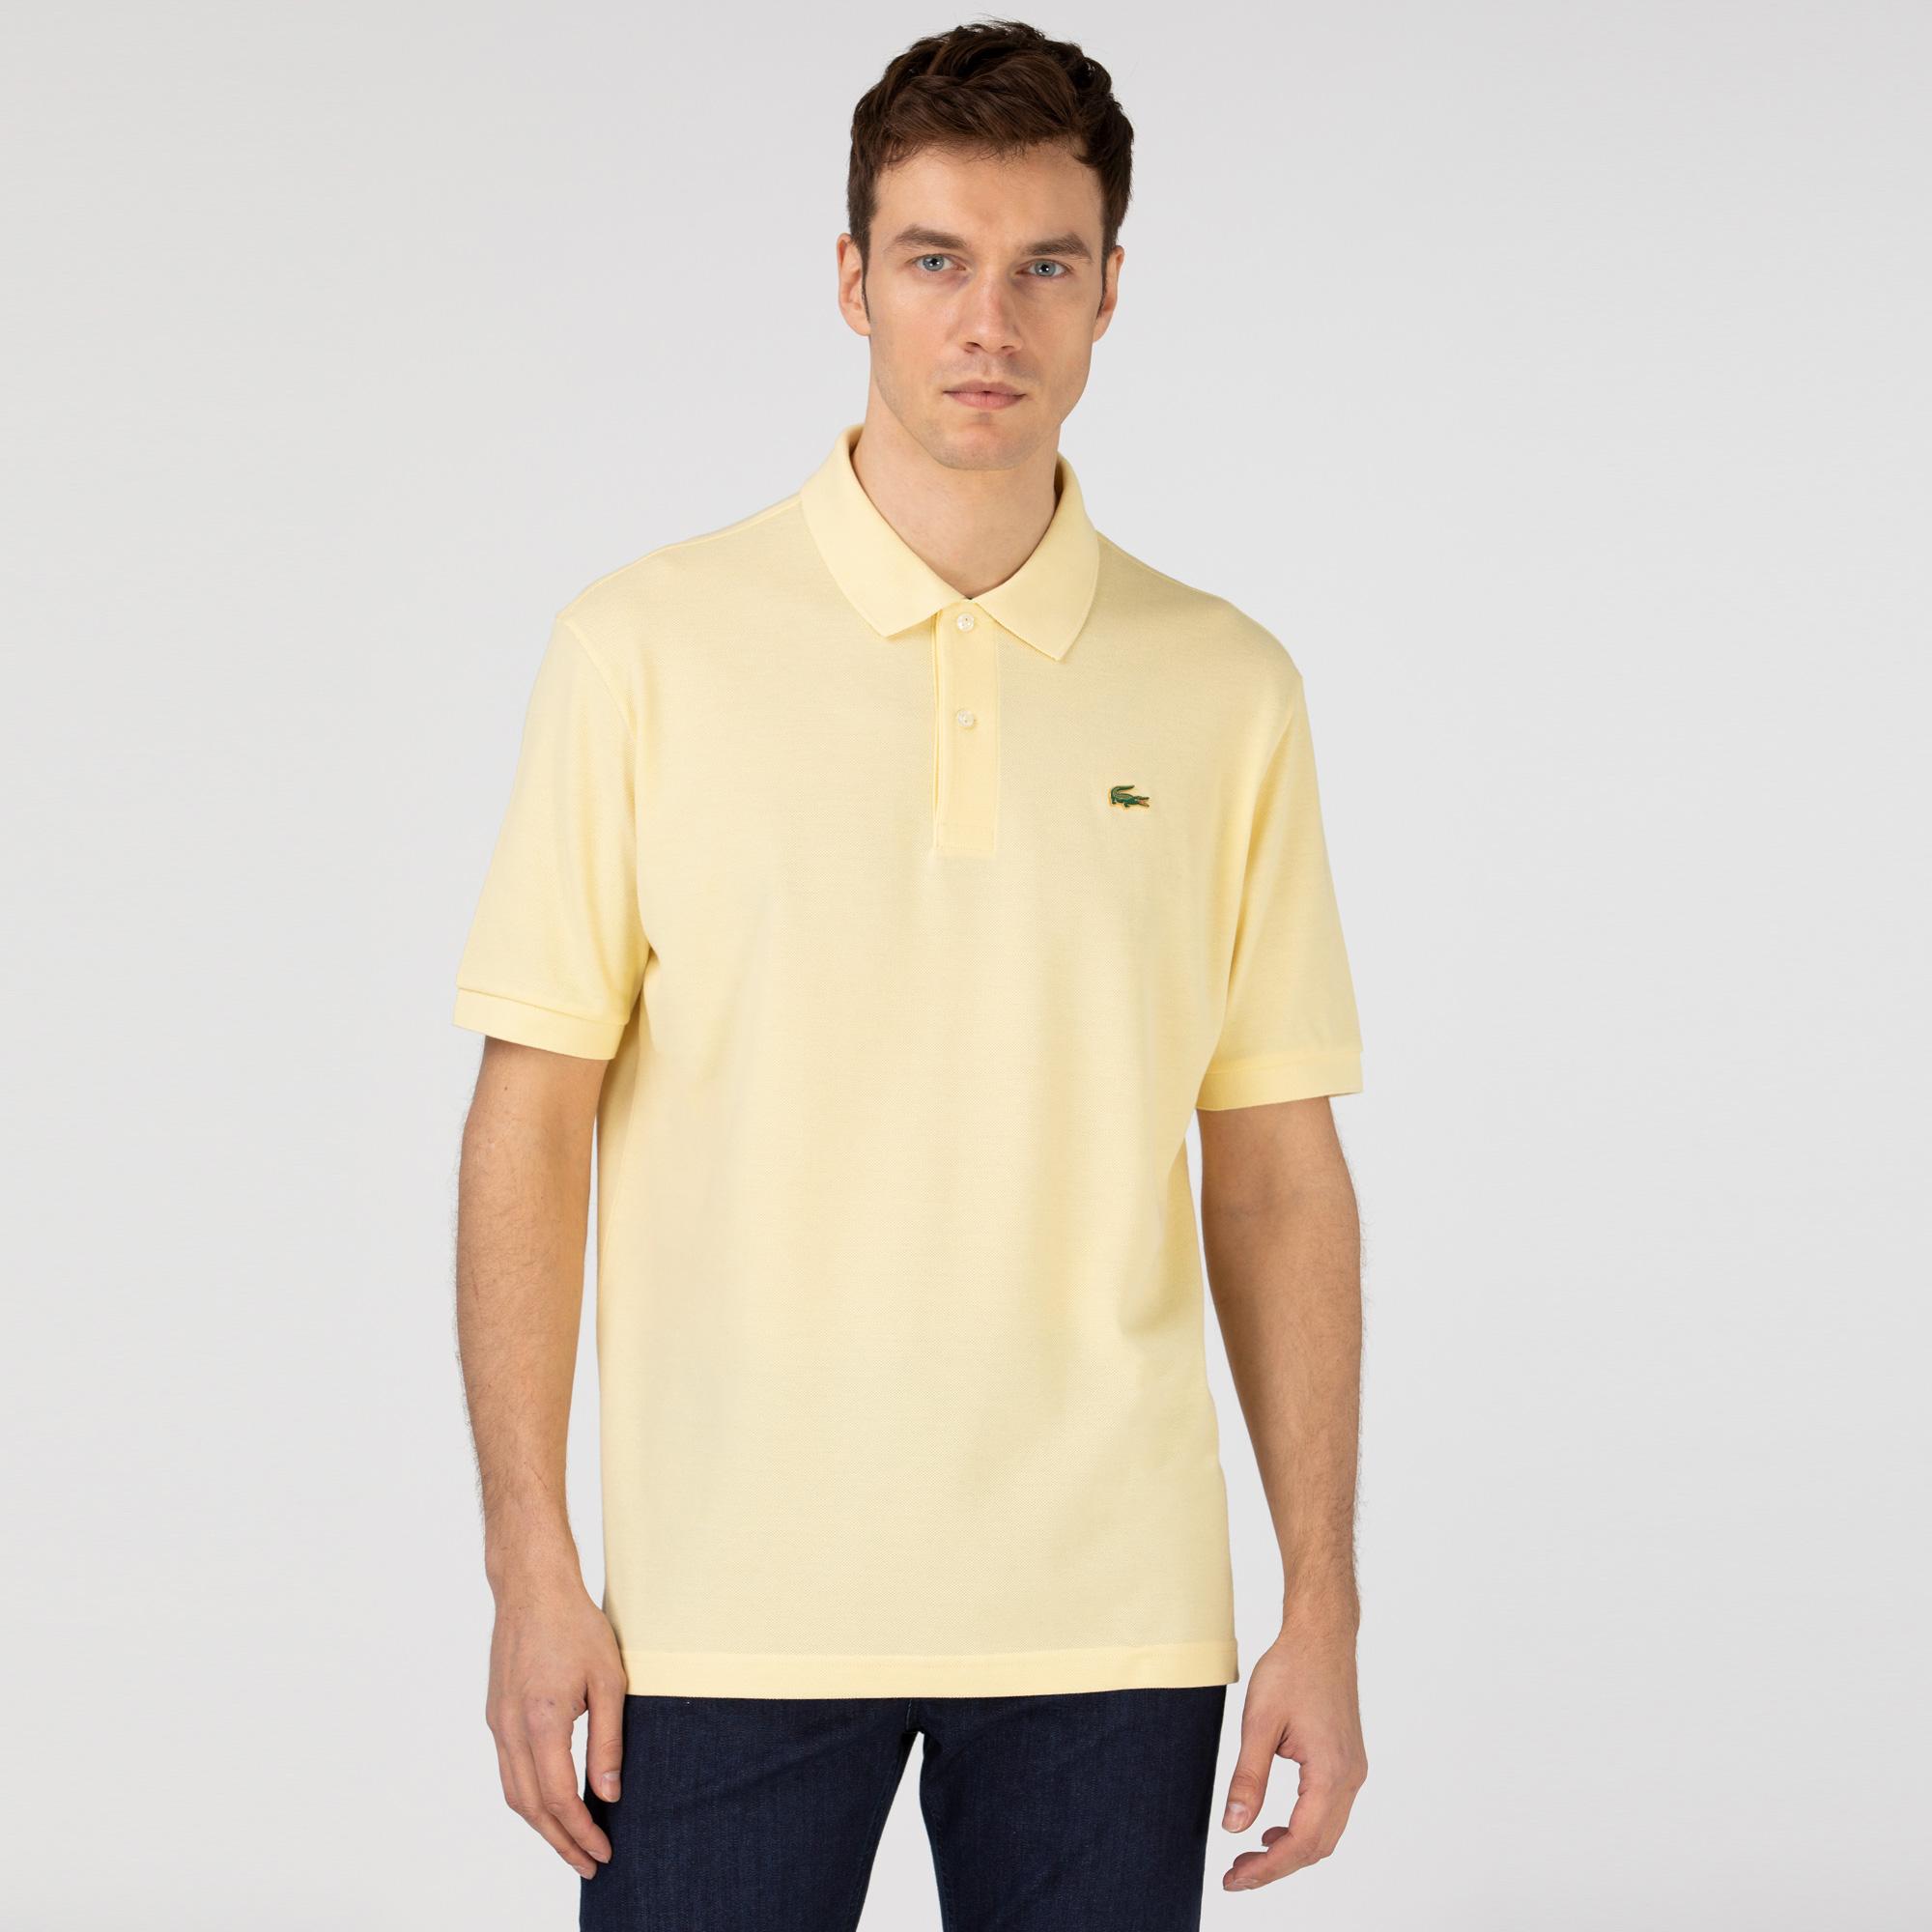 Lacoste L!VE Koszulka polo Loose Fit unisex z piki bawełnianej